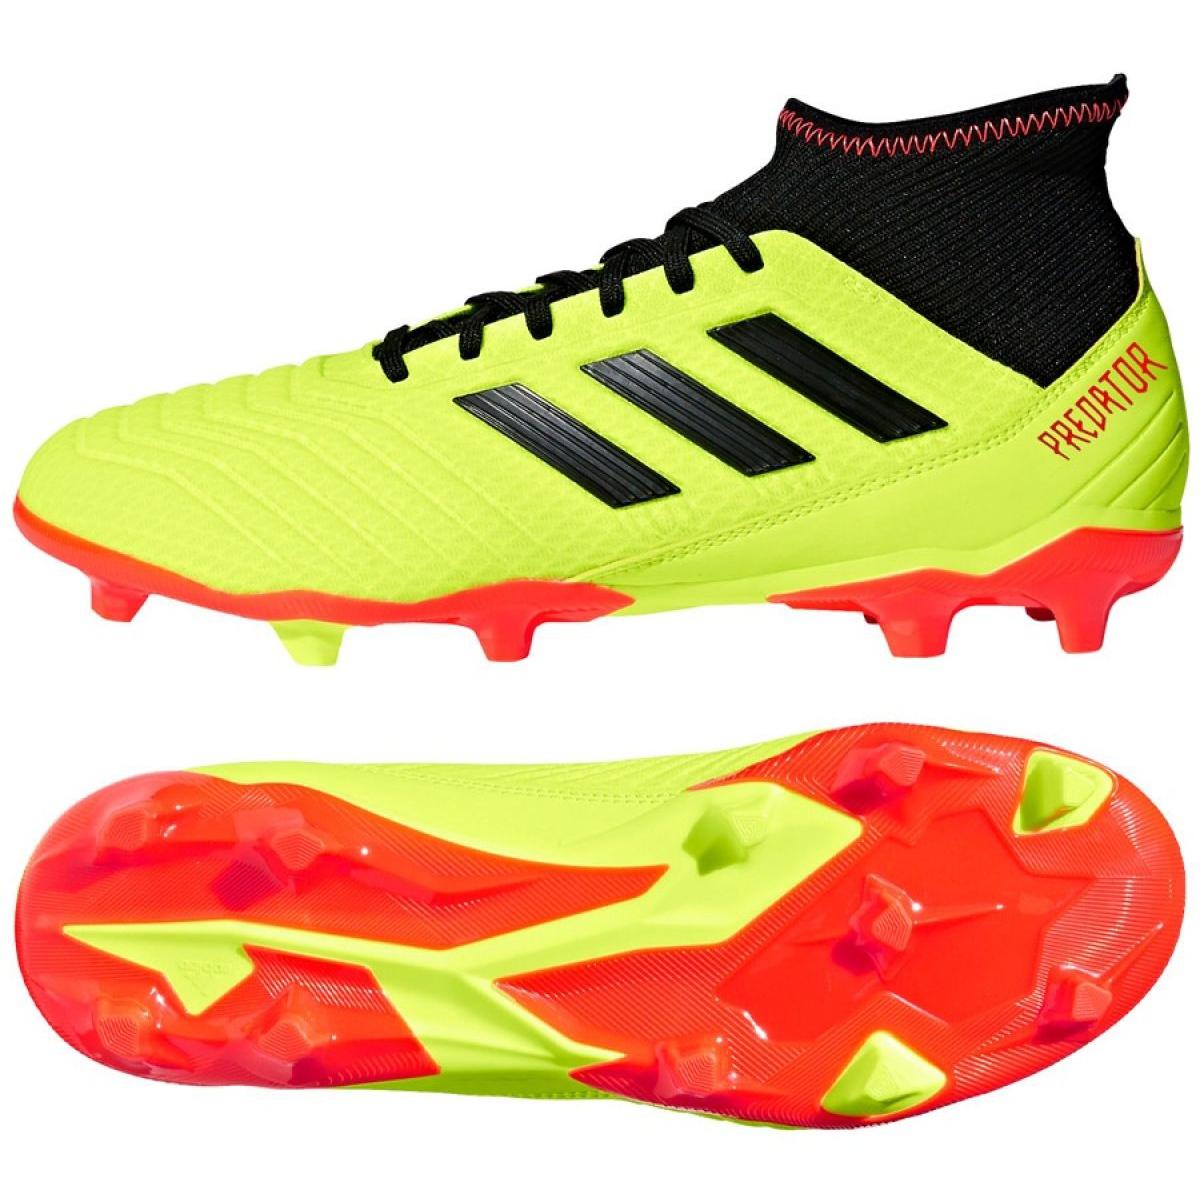 Football bottes adidas Prougeator 18.3 Fg M DB2003